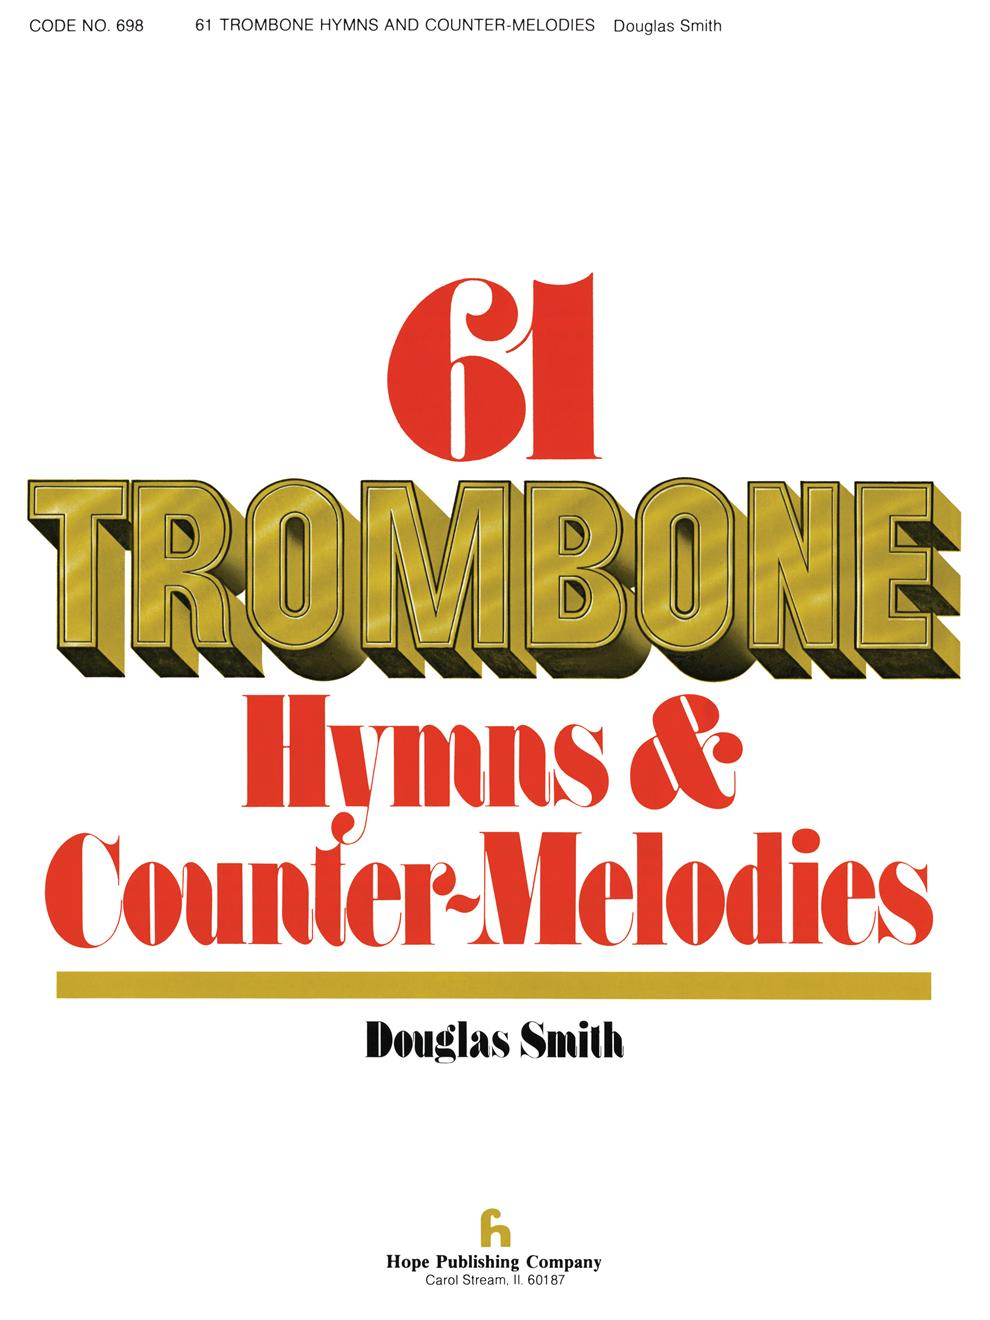 SIXTYONE TROMBONE HYMNS & CM V1 -Cover Image